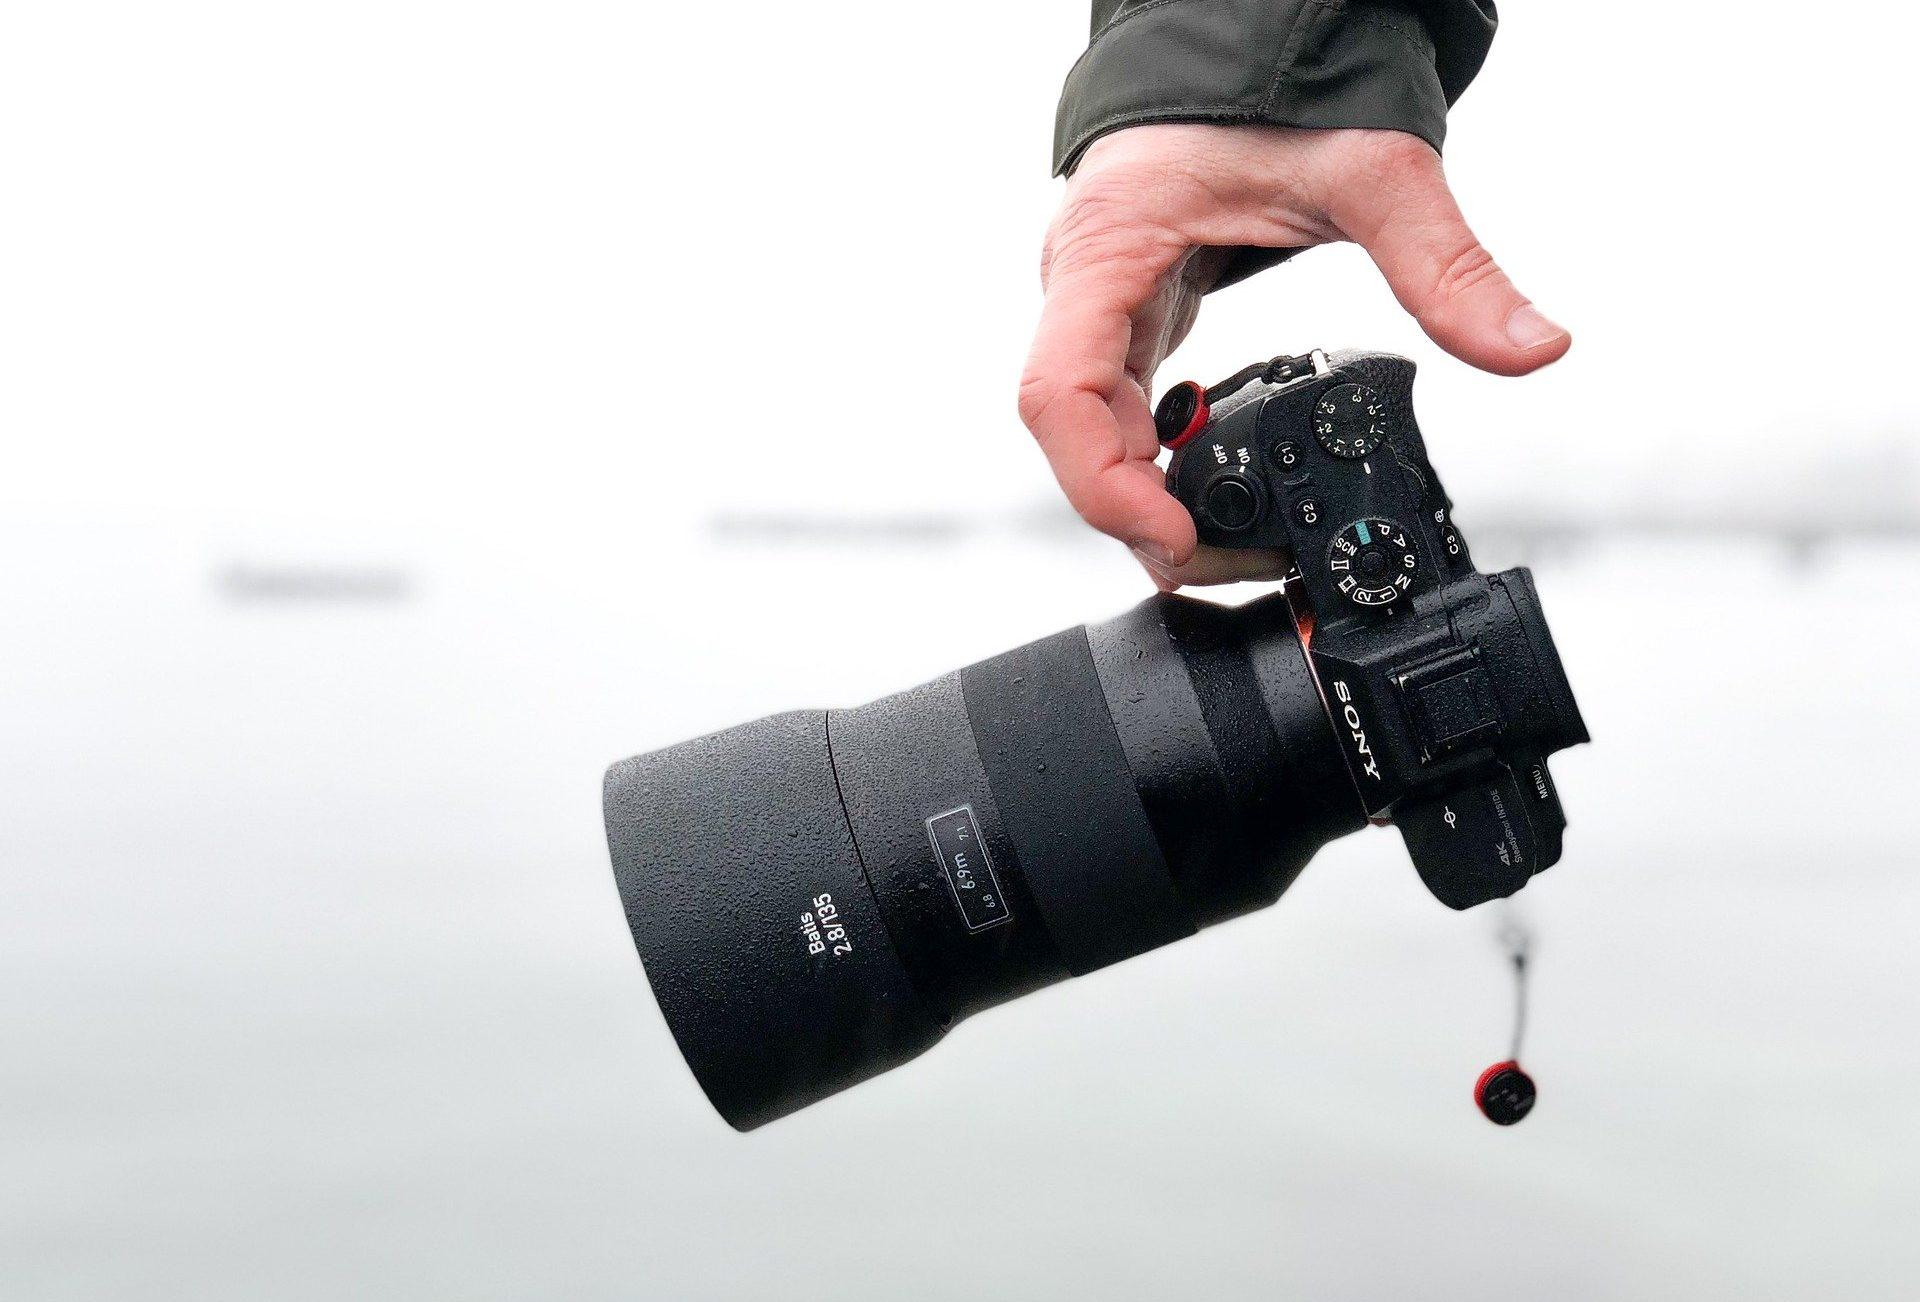 camera-4123304_1920